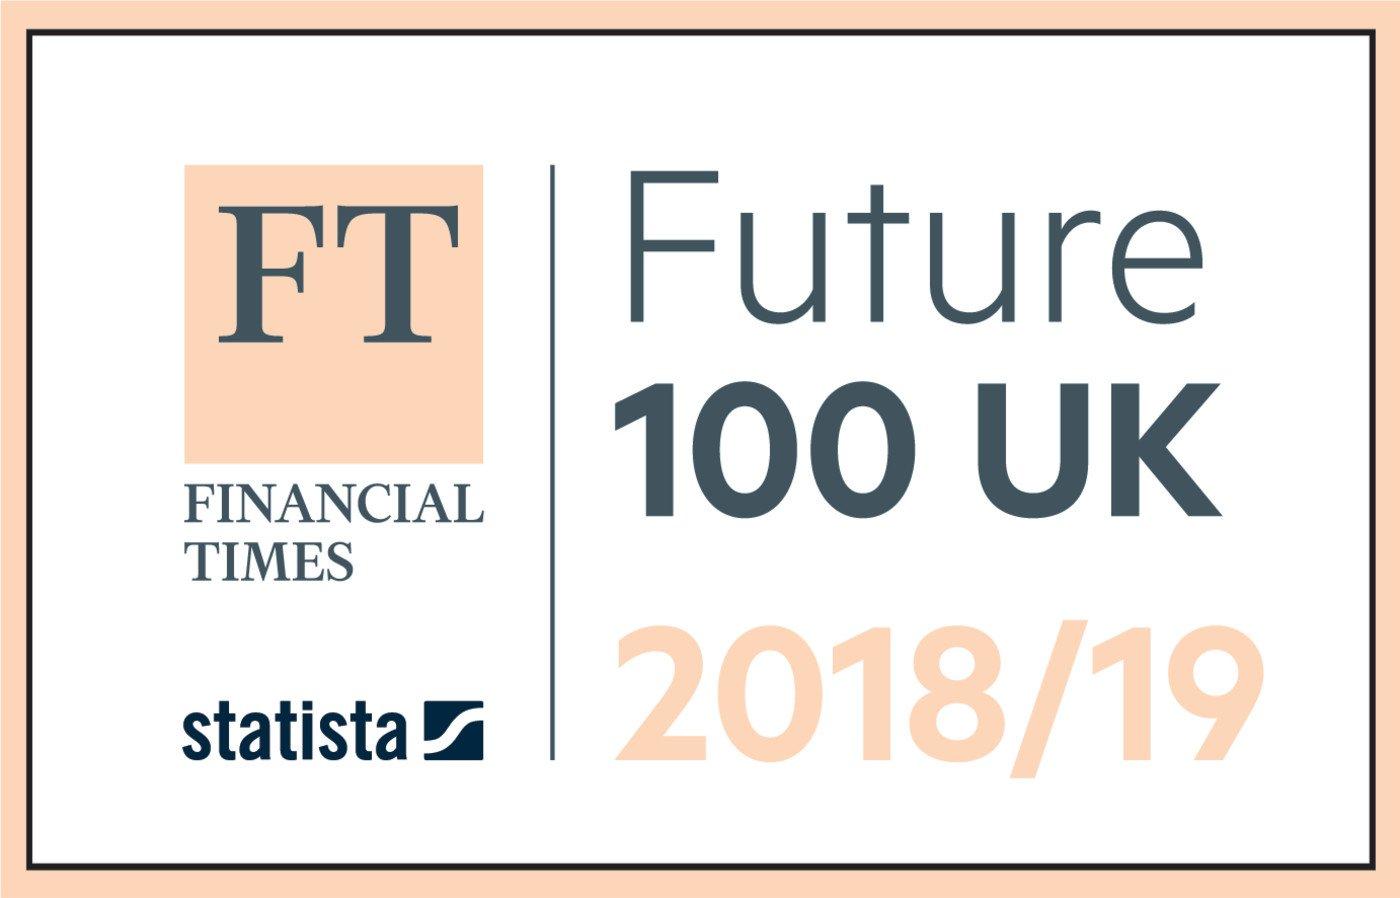 Future 100 UK 2018/2019